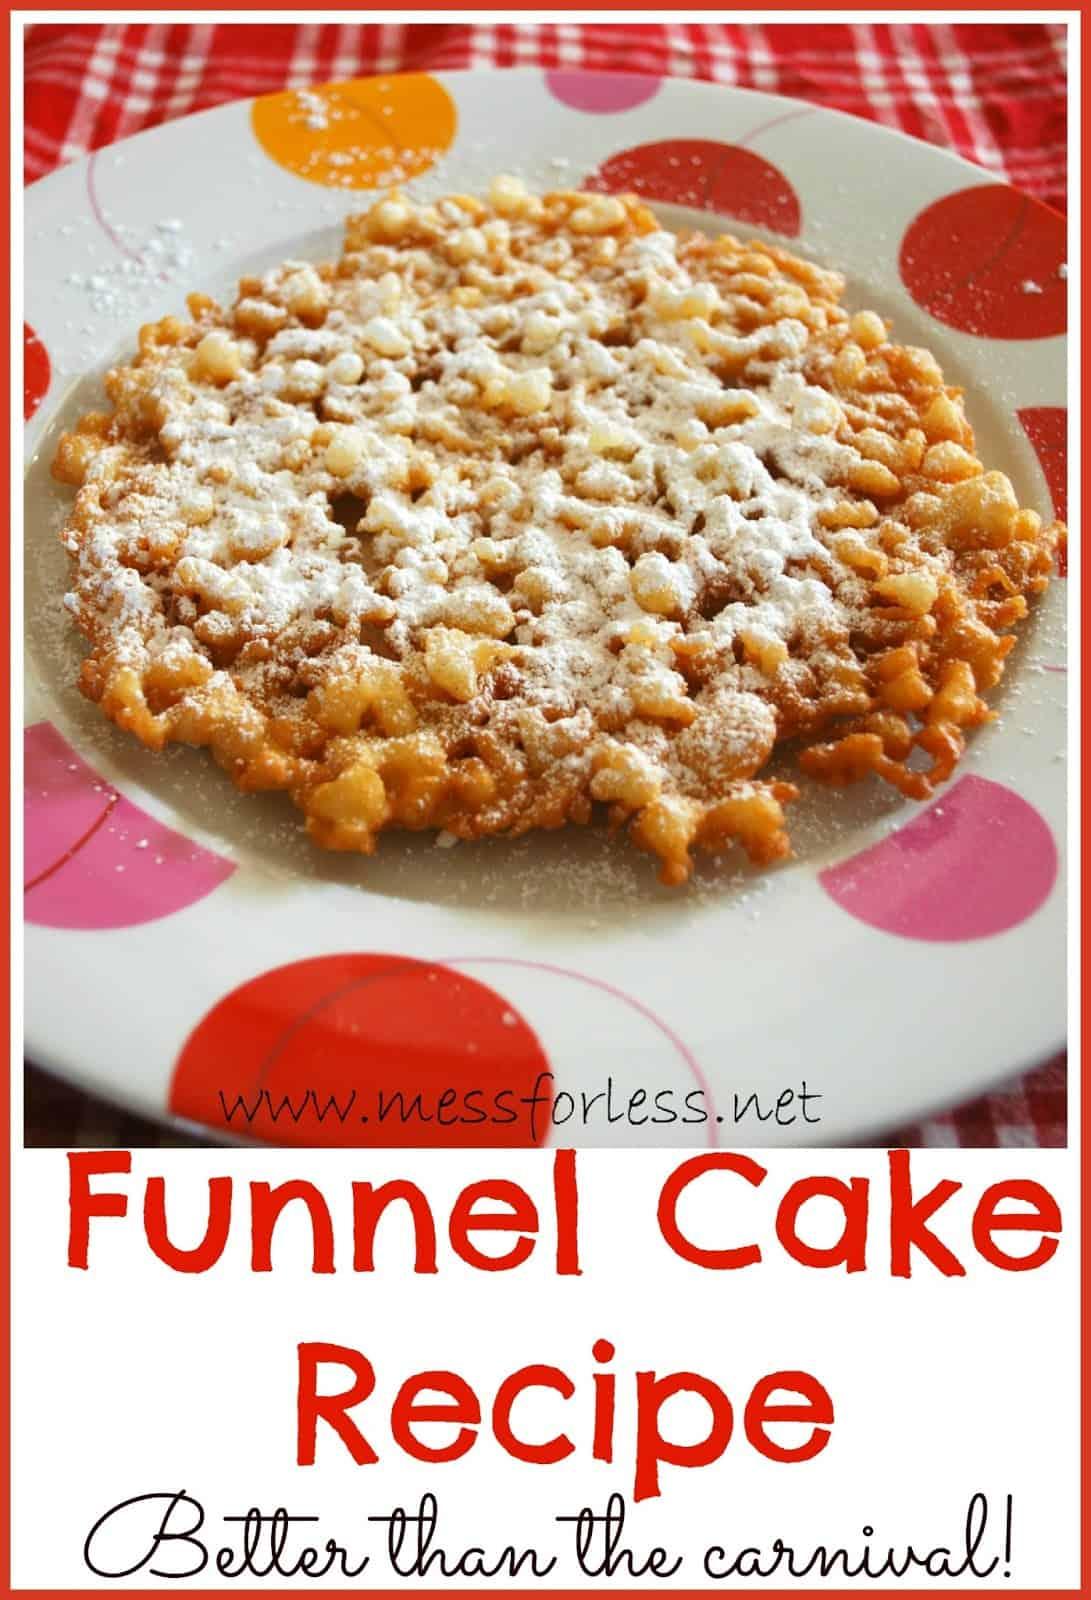 Make Ahead Funnel Cake Recipe